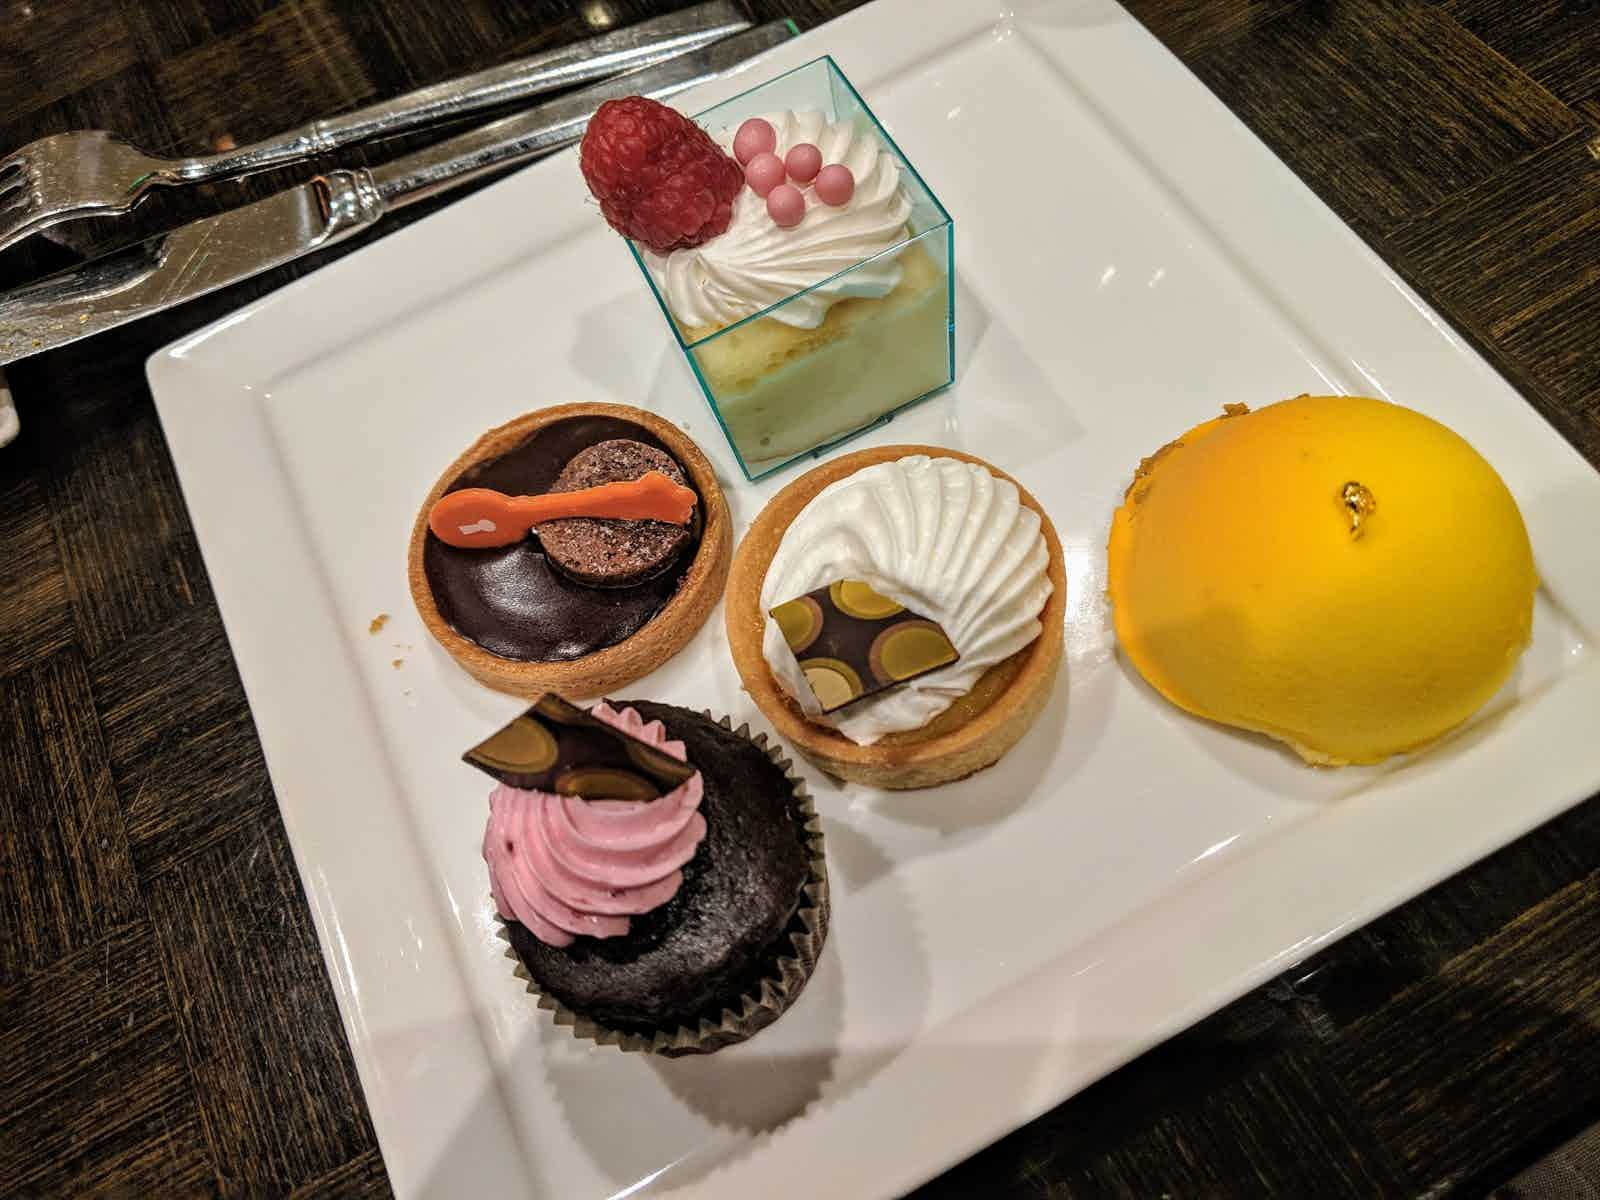 Petit Buffet Art Deco wicked spoon - las vegas | restaurant review - zagat